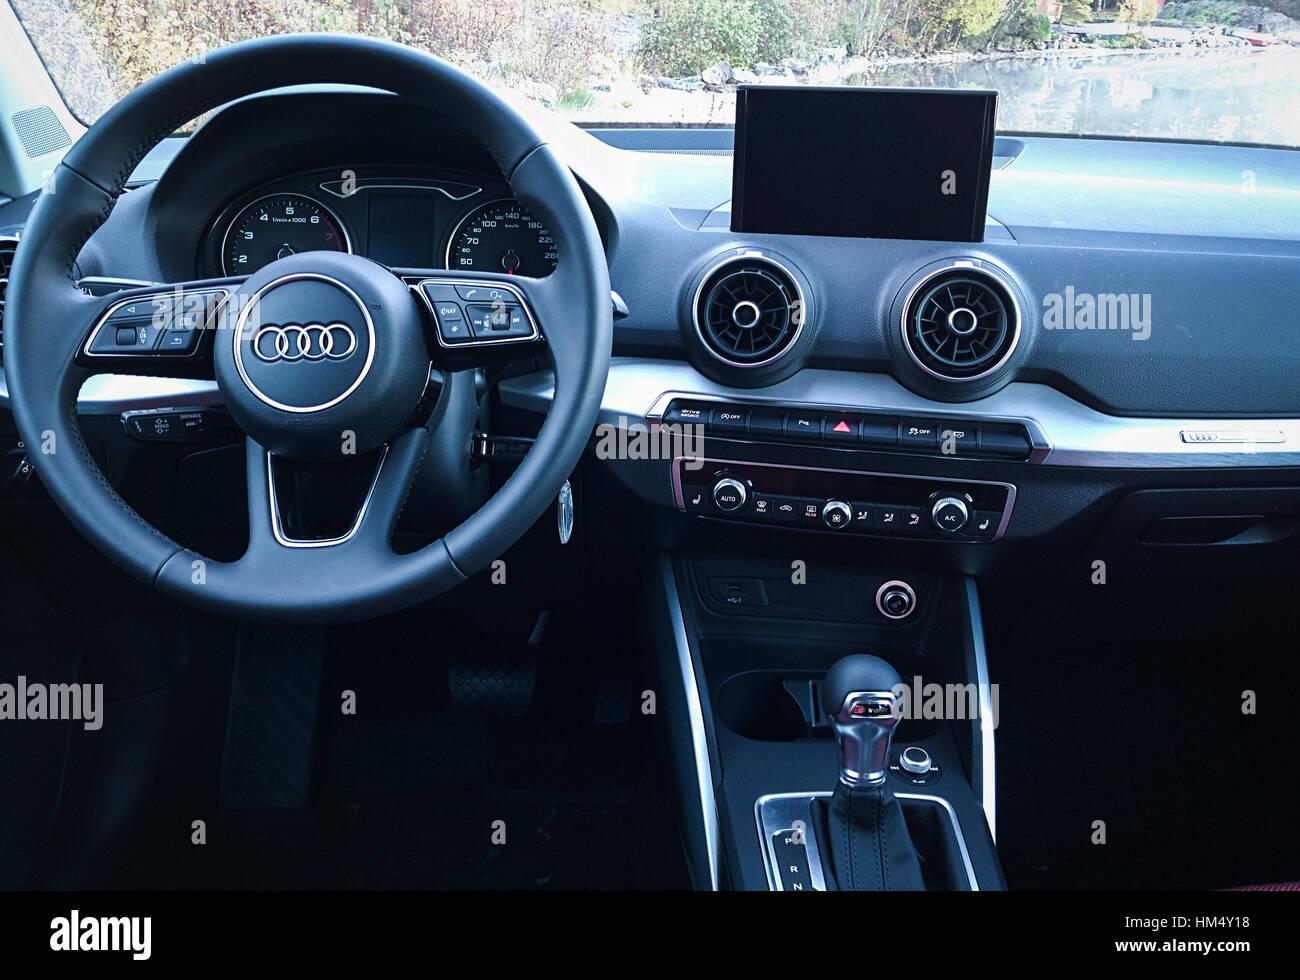 Audi Q2 Interieur Stockfoto, Bild: 132874708 - Alamy